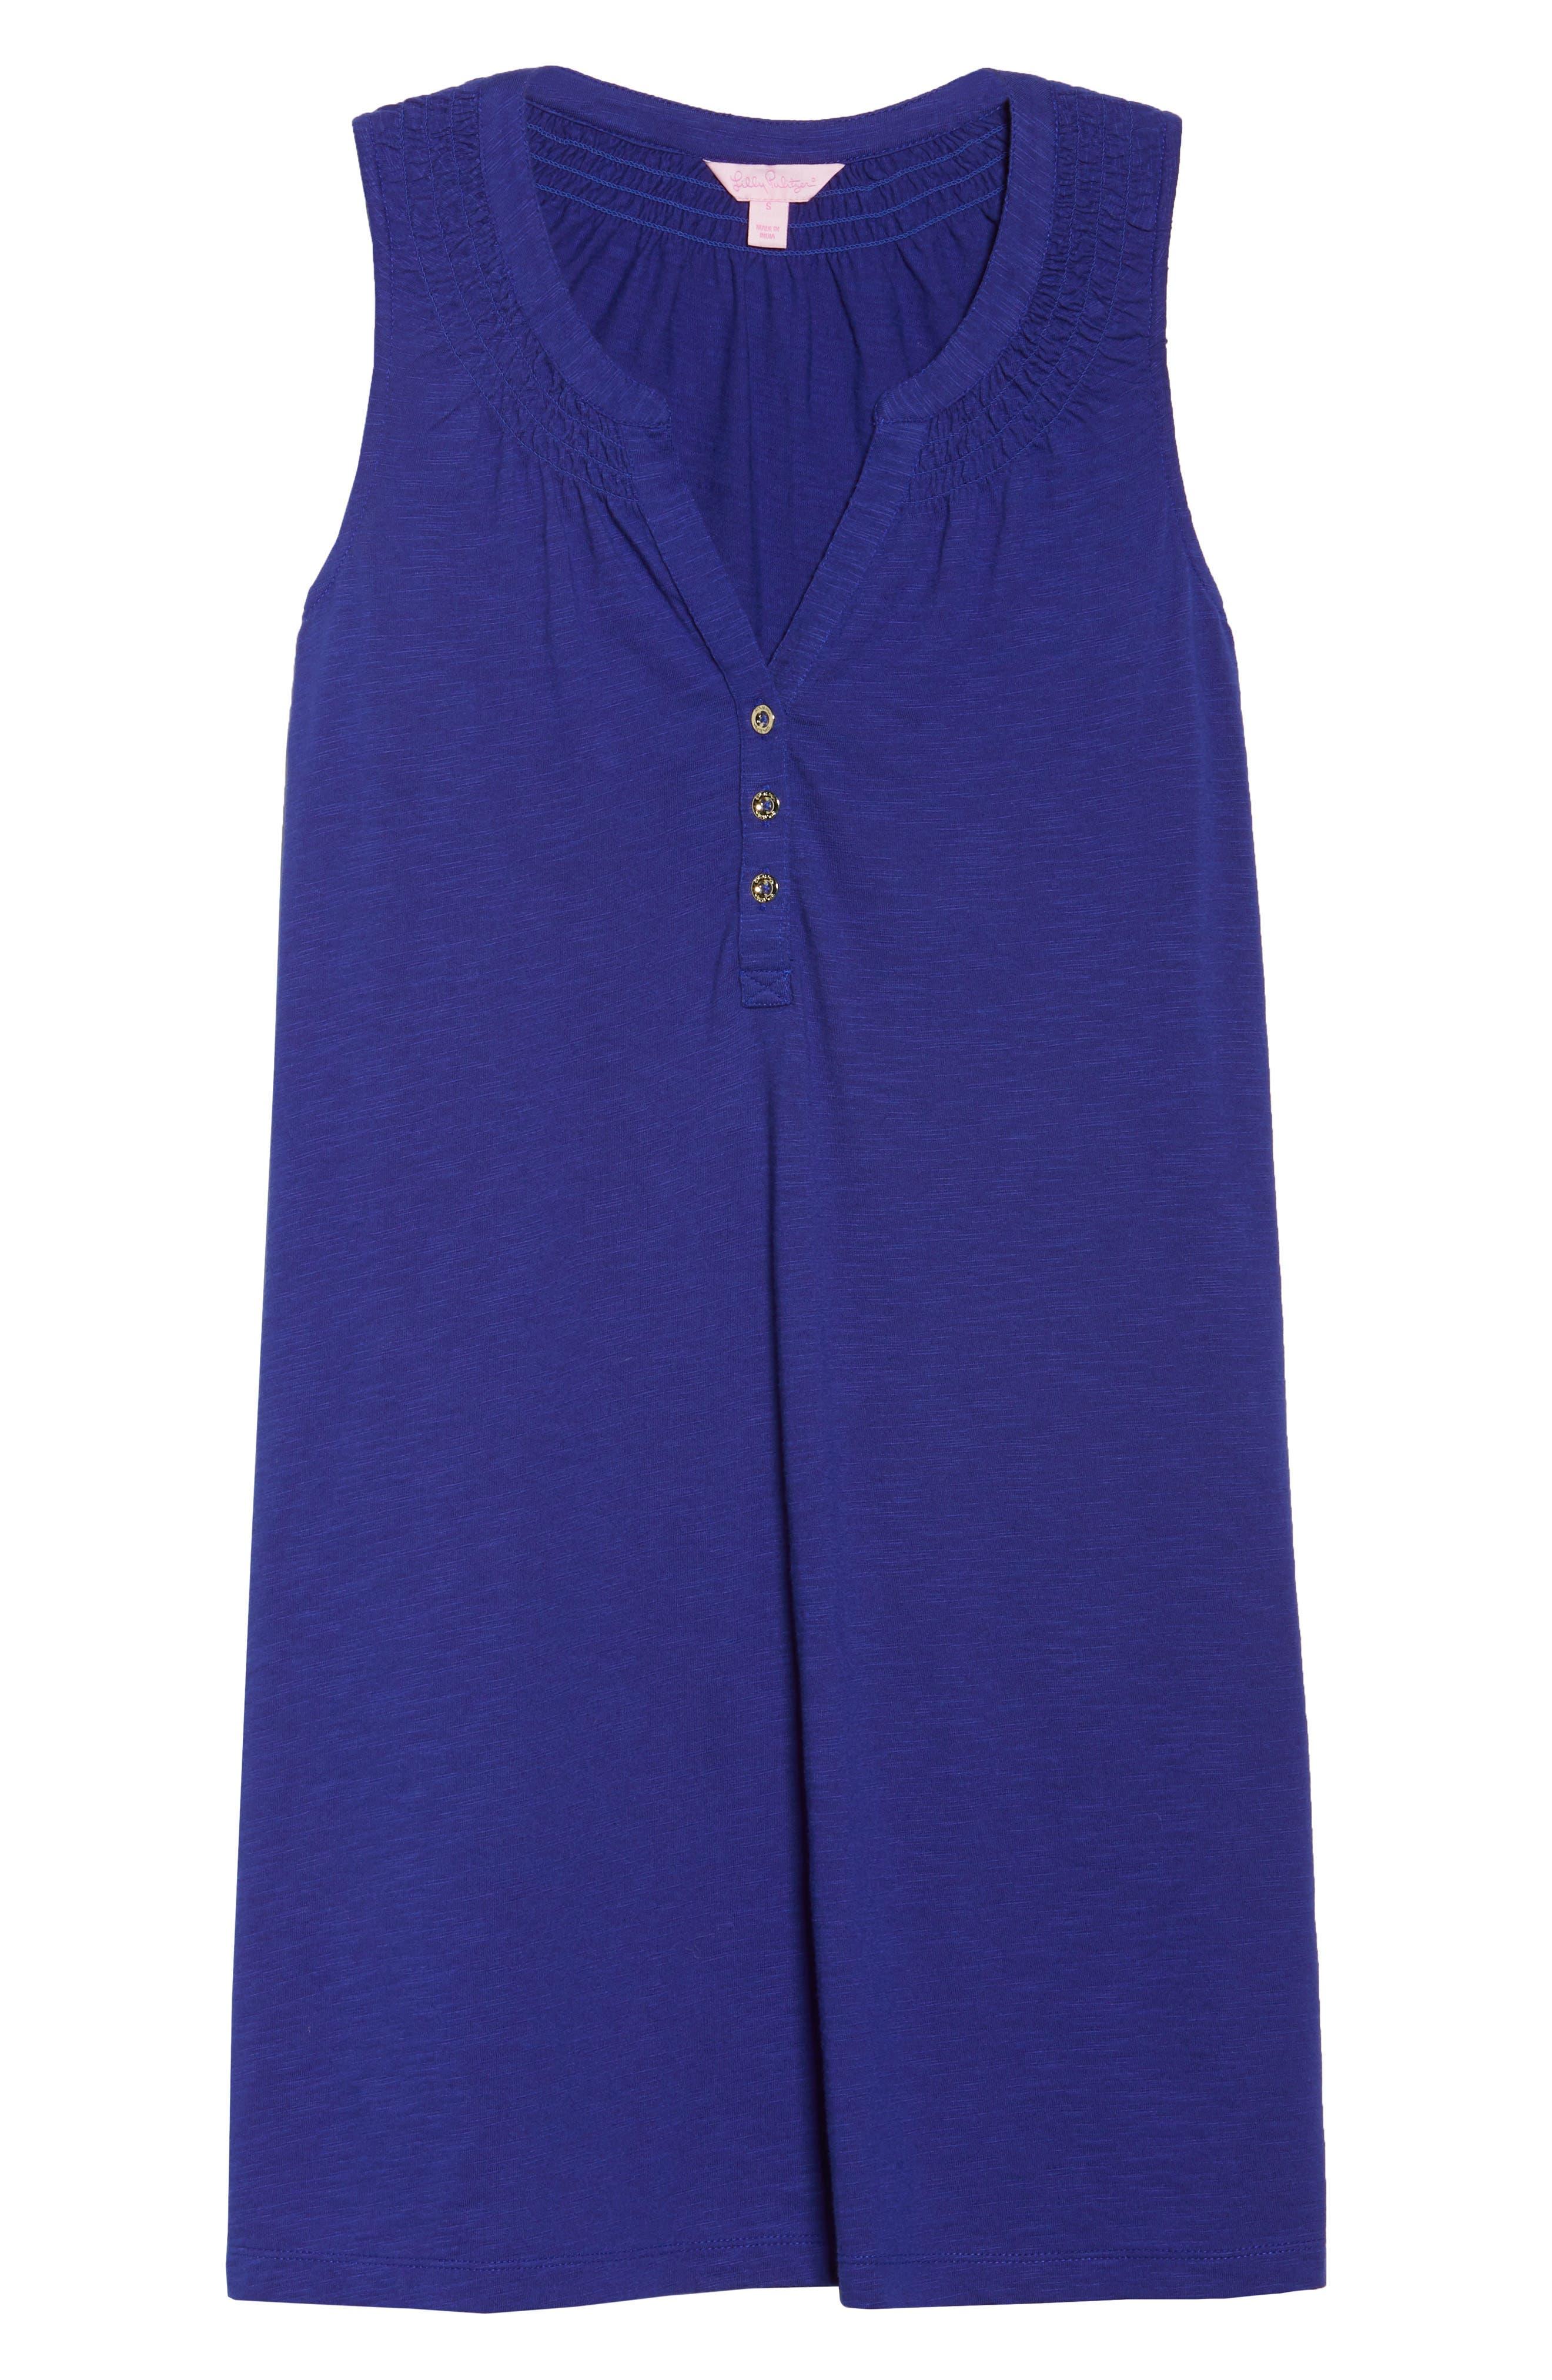 Essie Shift Dress,                             Alternate thumbnail 7, color,                             Twilight Blue